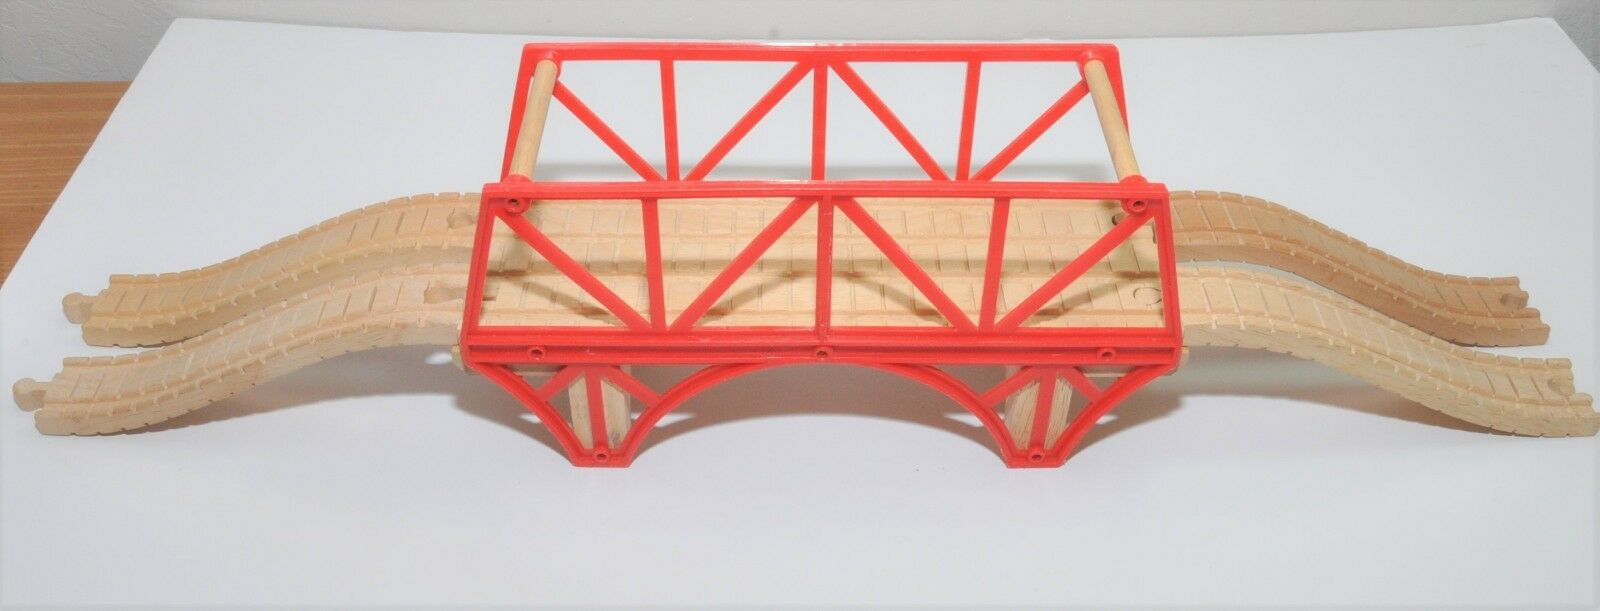 Very rare DOUBLE WIDE OLD IRON BRIDGE / RetiROT Thomas wooden piece